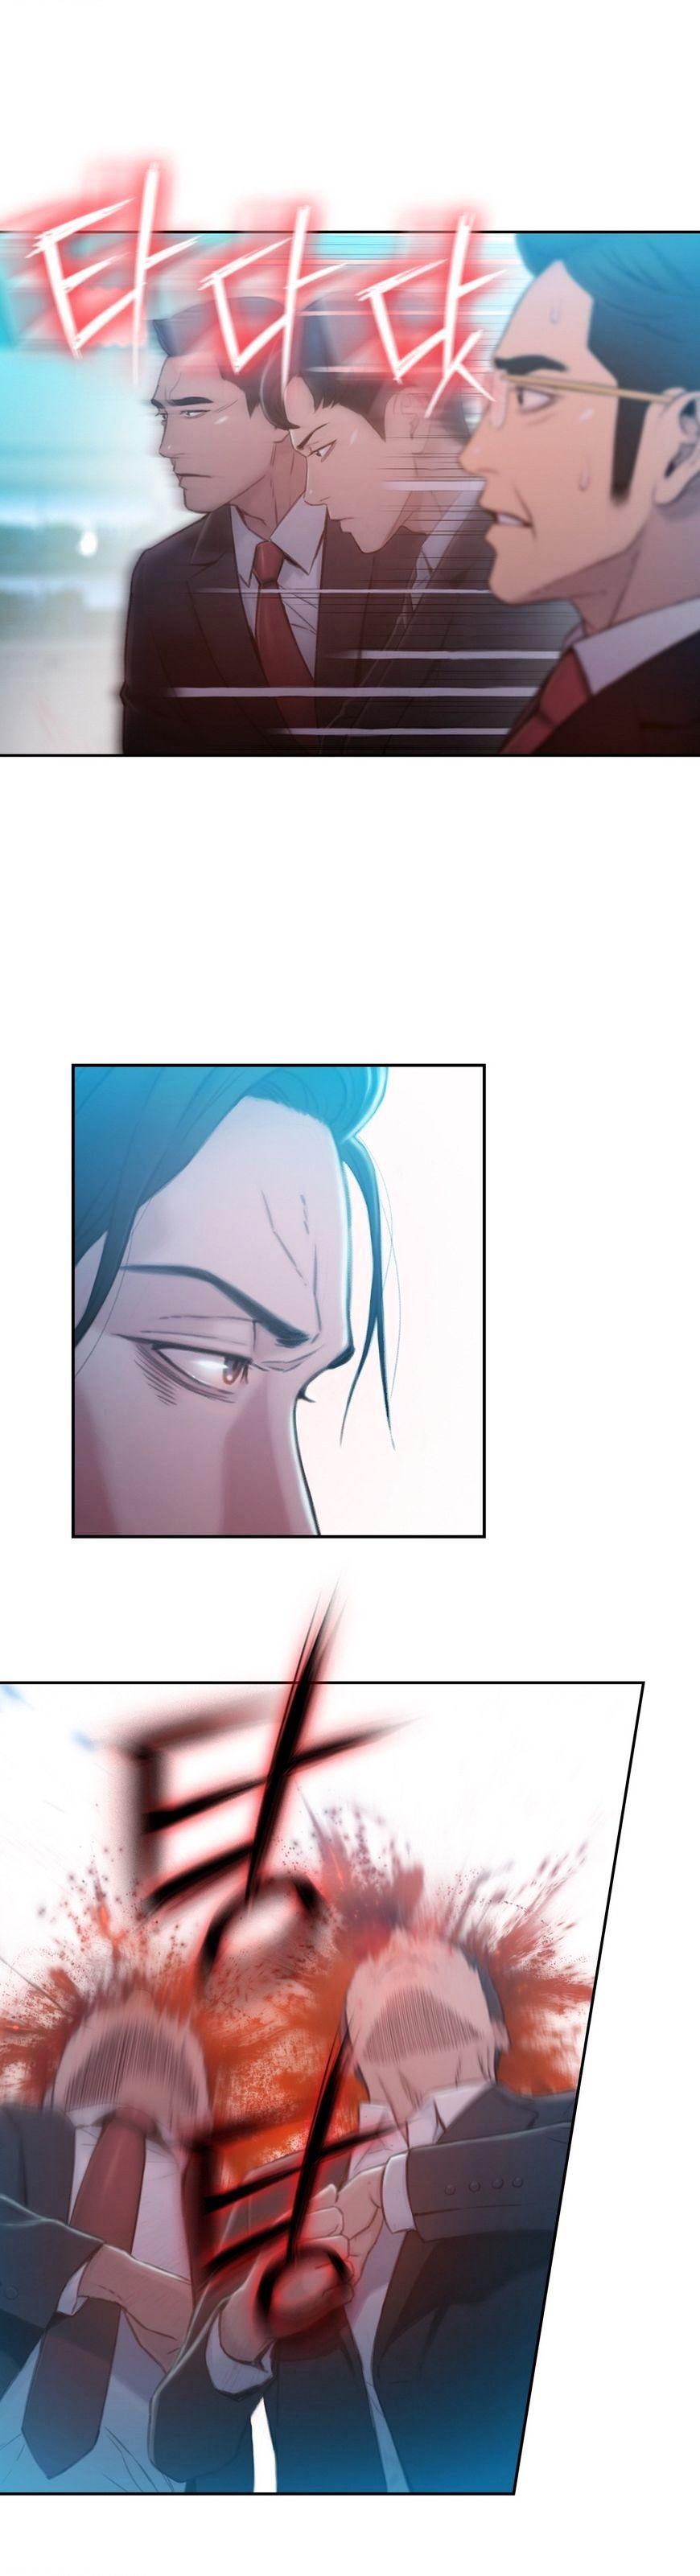 Sweet Guy Chapter 73 Full Manga Read Scan Image 15